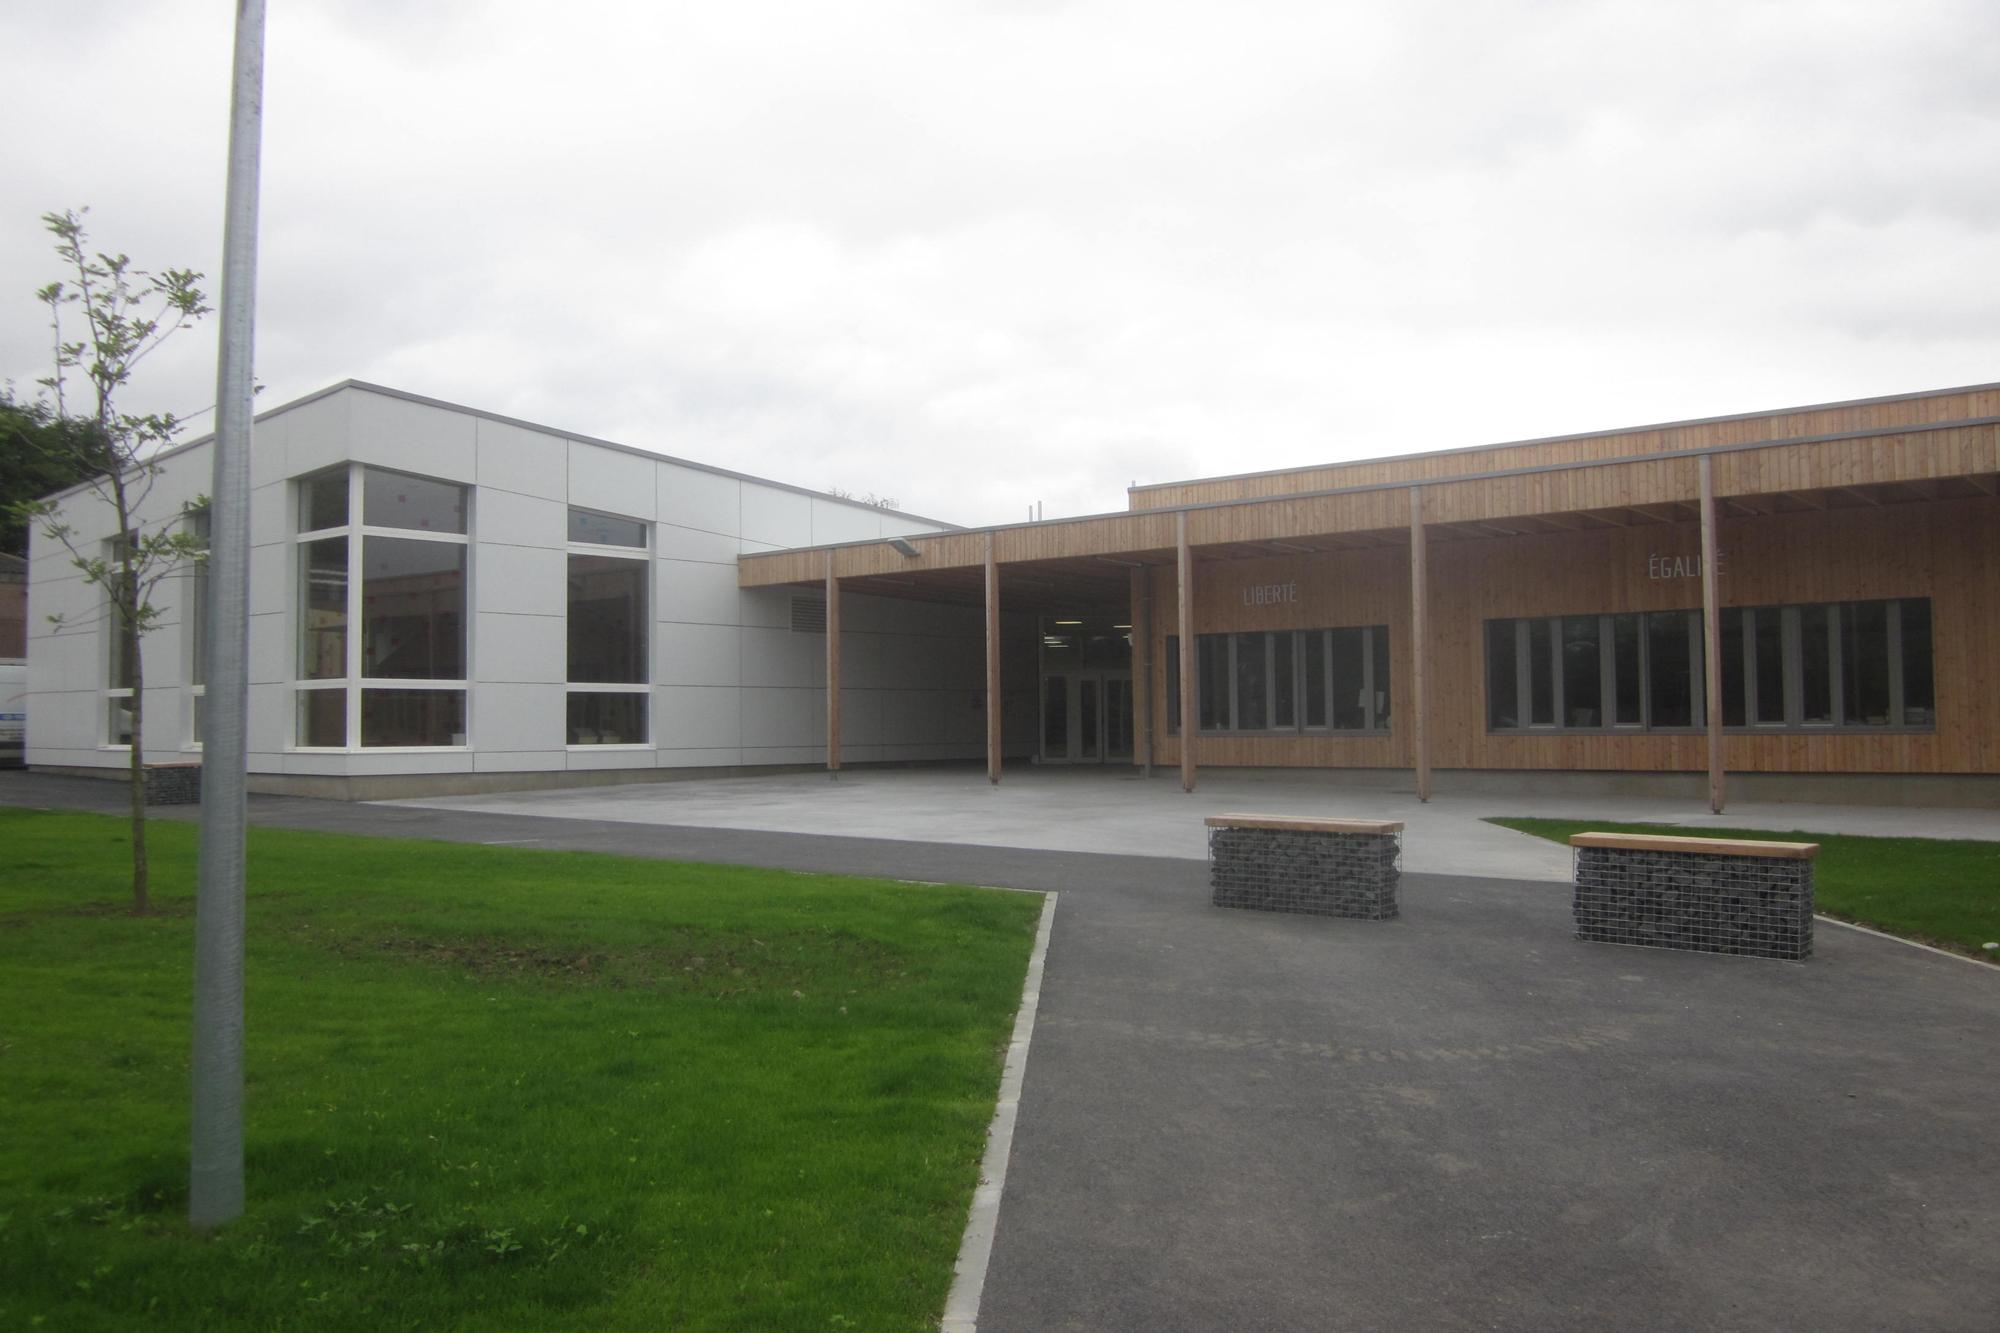 TEMPLEUVE_Groupe scolaire_FARGEOT_2014-05-28 (4)